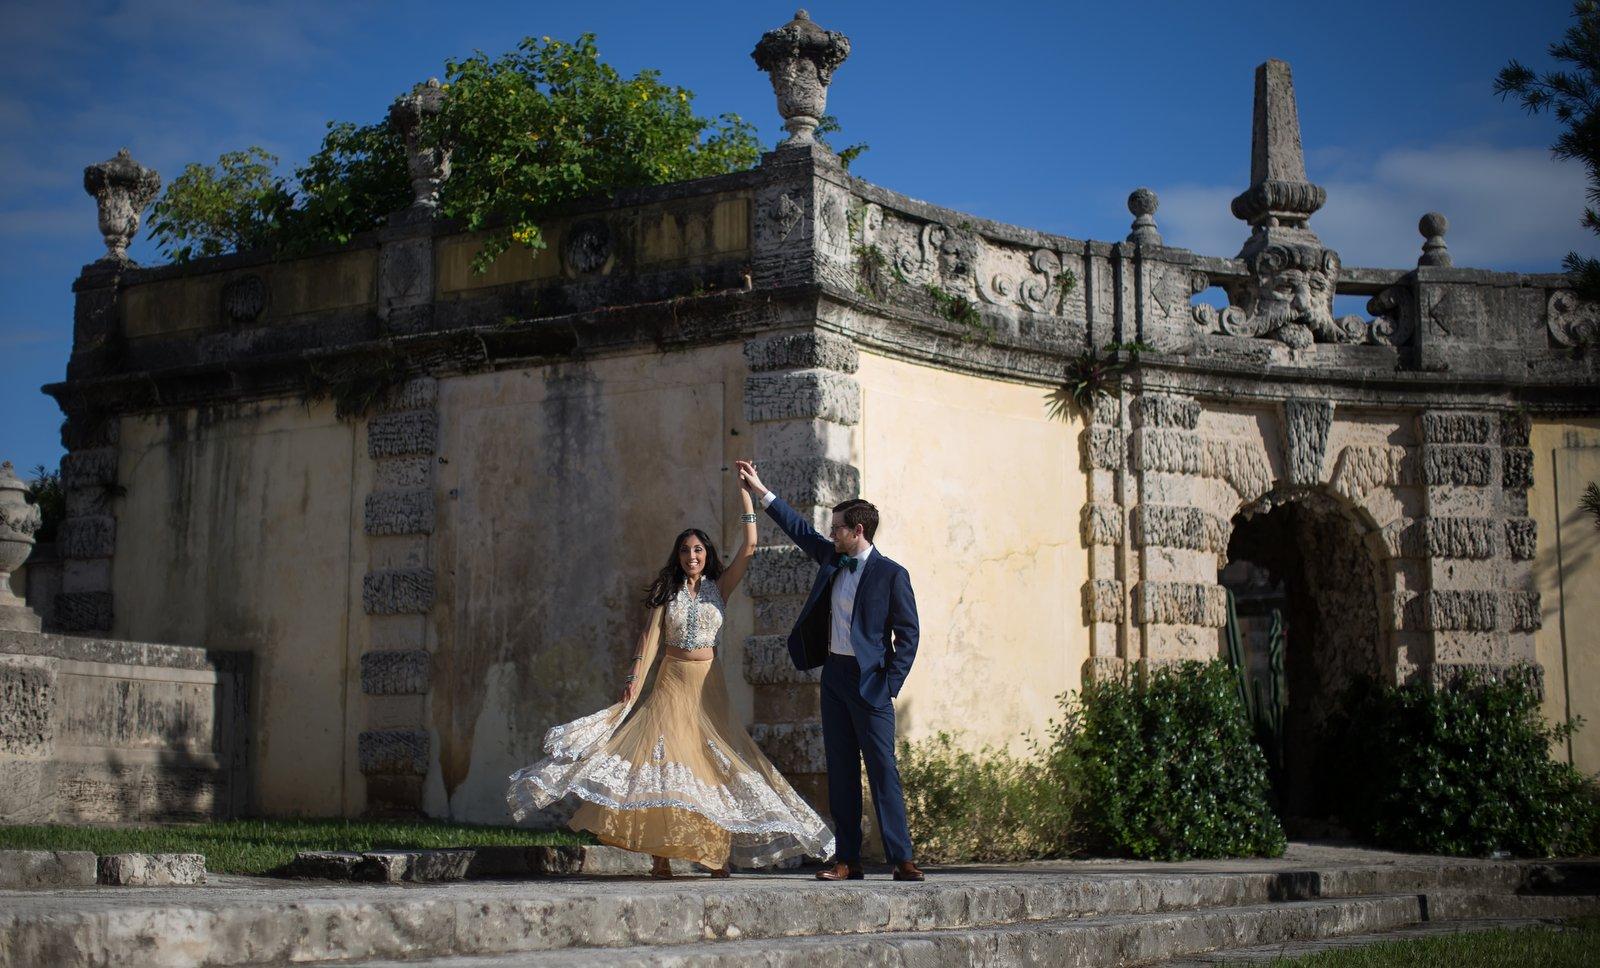 Ketki | Vizcaya Engagement Session, Miami, Miami Wedding Photographers | Häring Photography, Indian Wedding Photographer in Florida, Best Muslim, Hindu - South East Asian Wedding Photographers